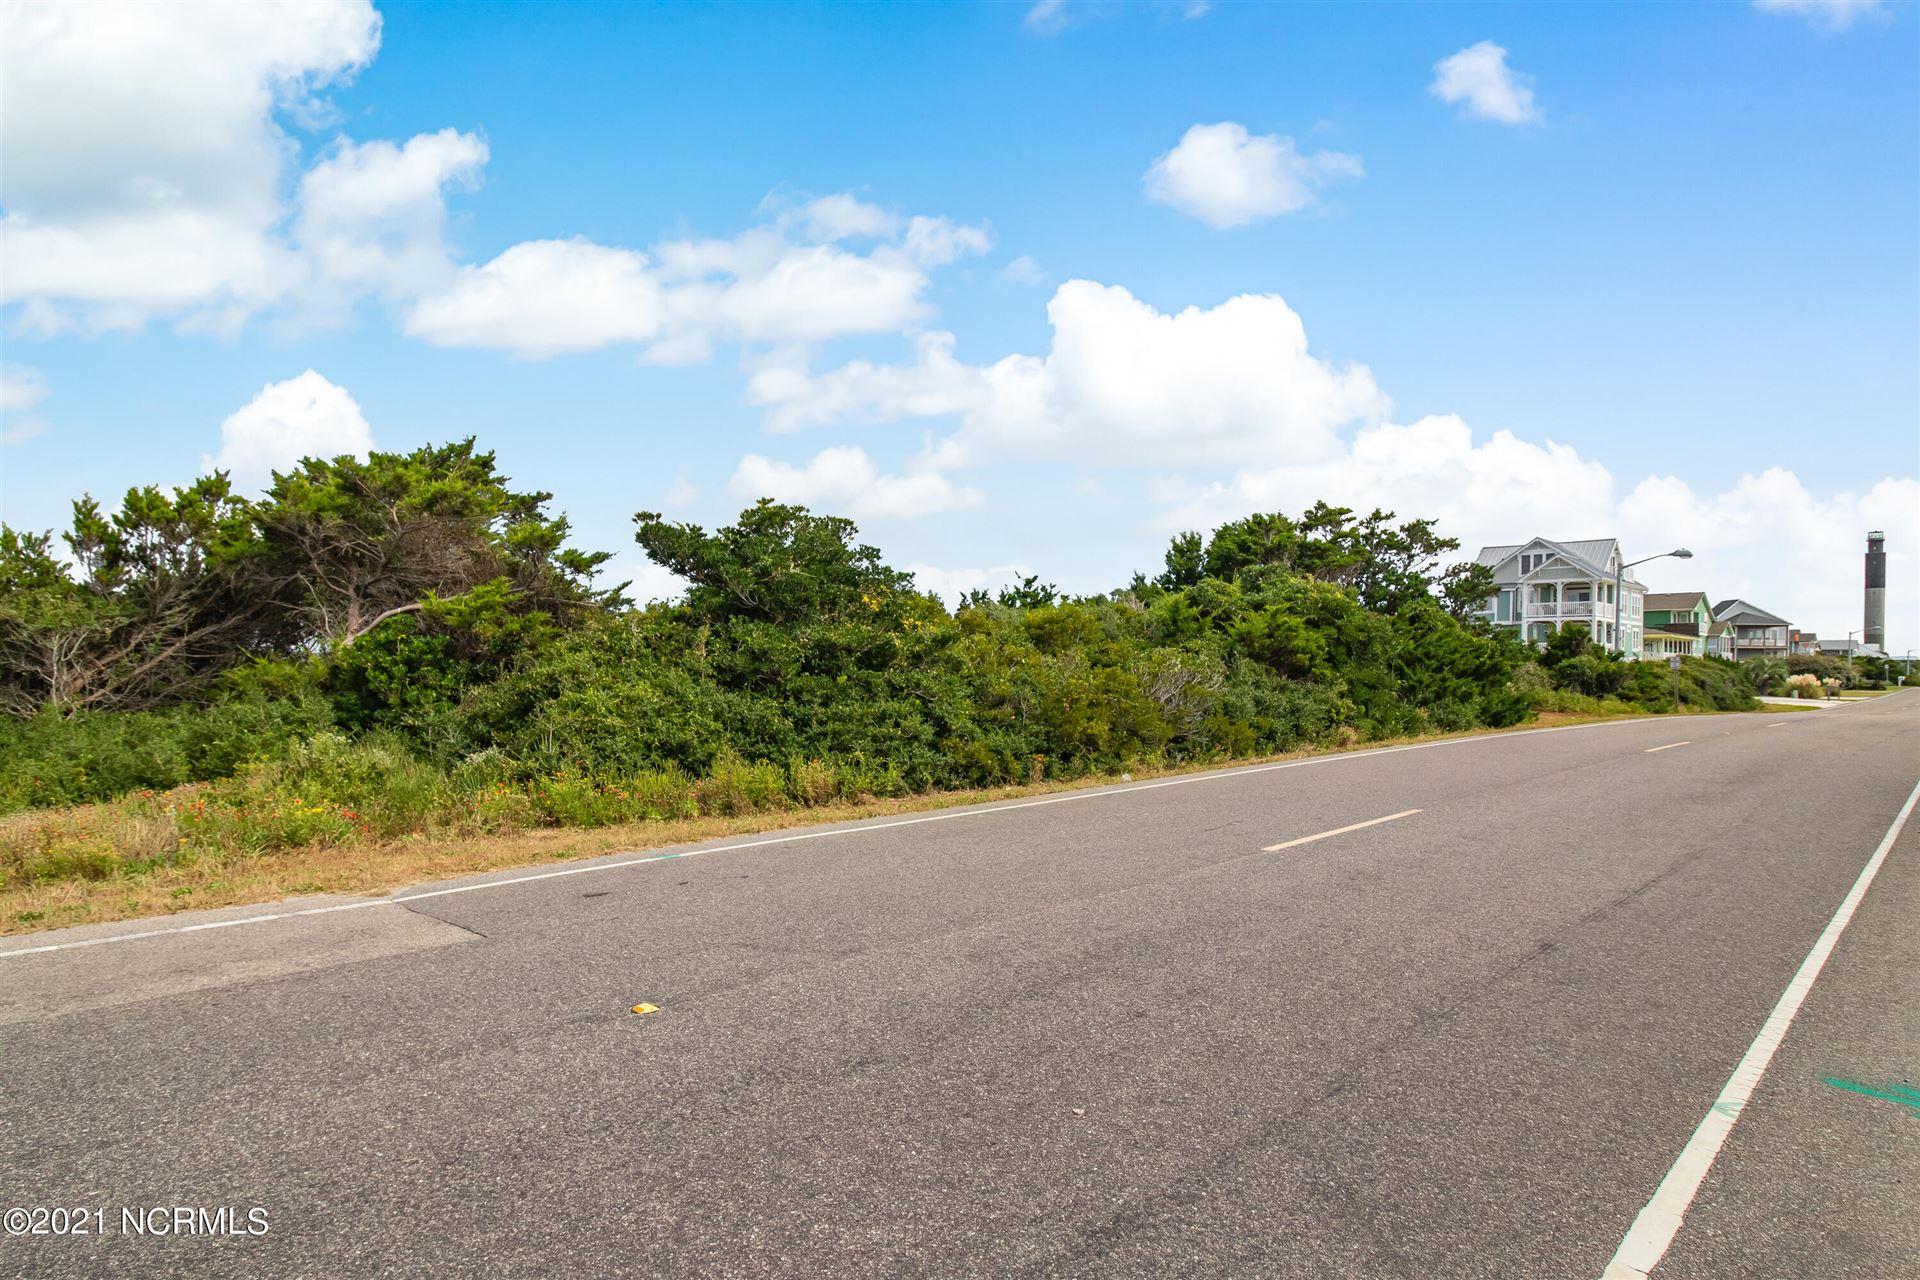 Photo of L-24 Caswell Beach Road, Caswell Beach, NC 28465 (MLS # 100295443)